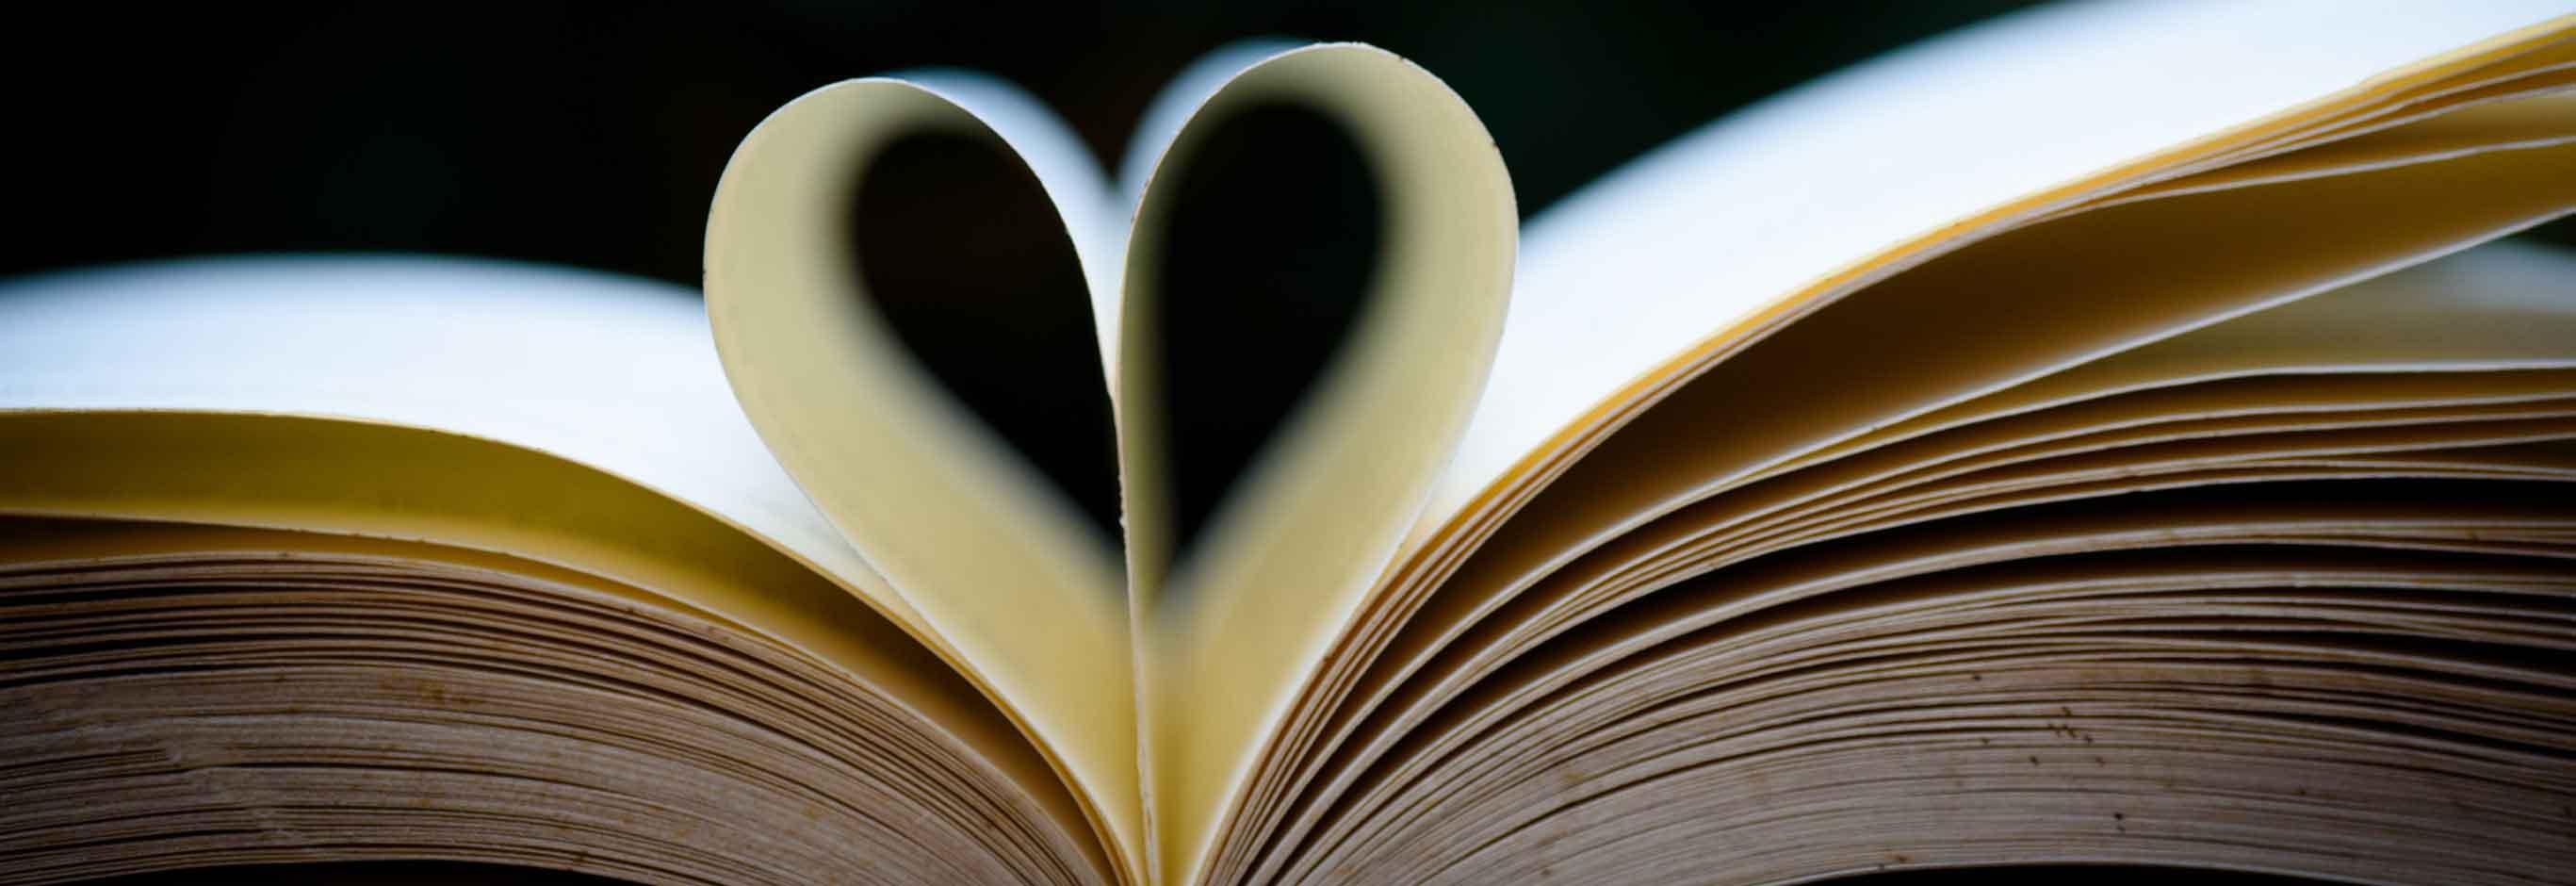 13 Secrets of Rare Book Dealers | Mental Floss